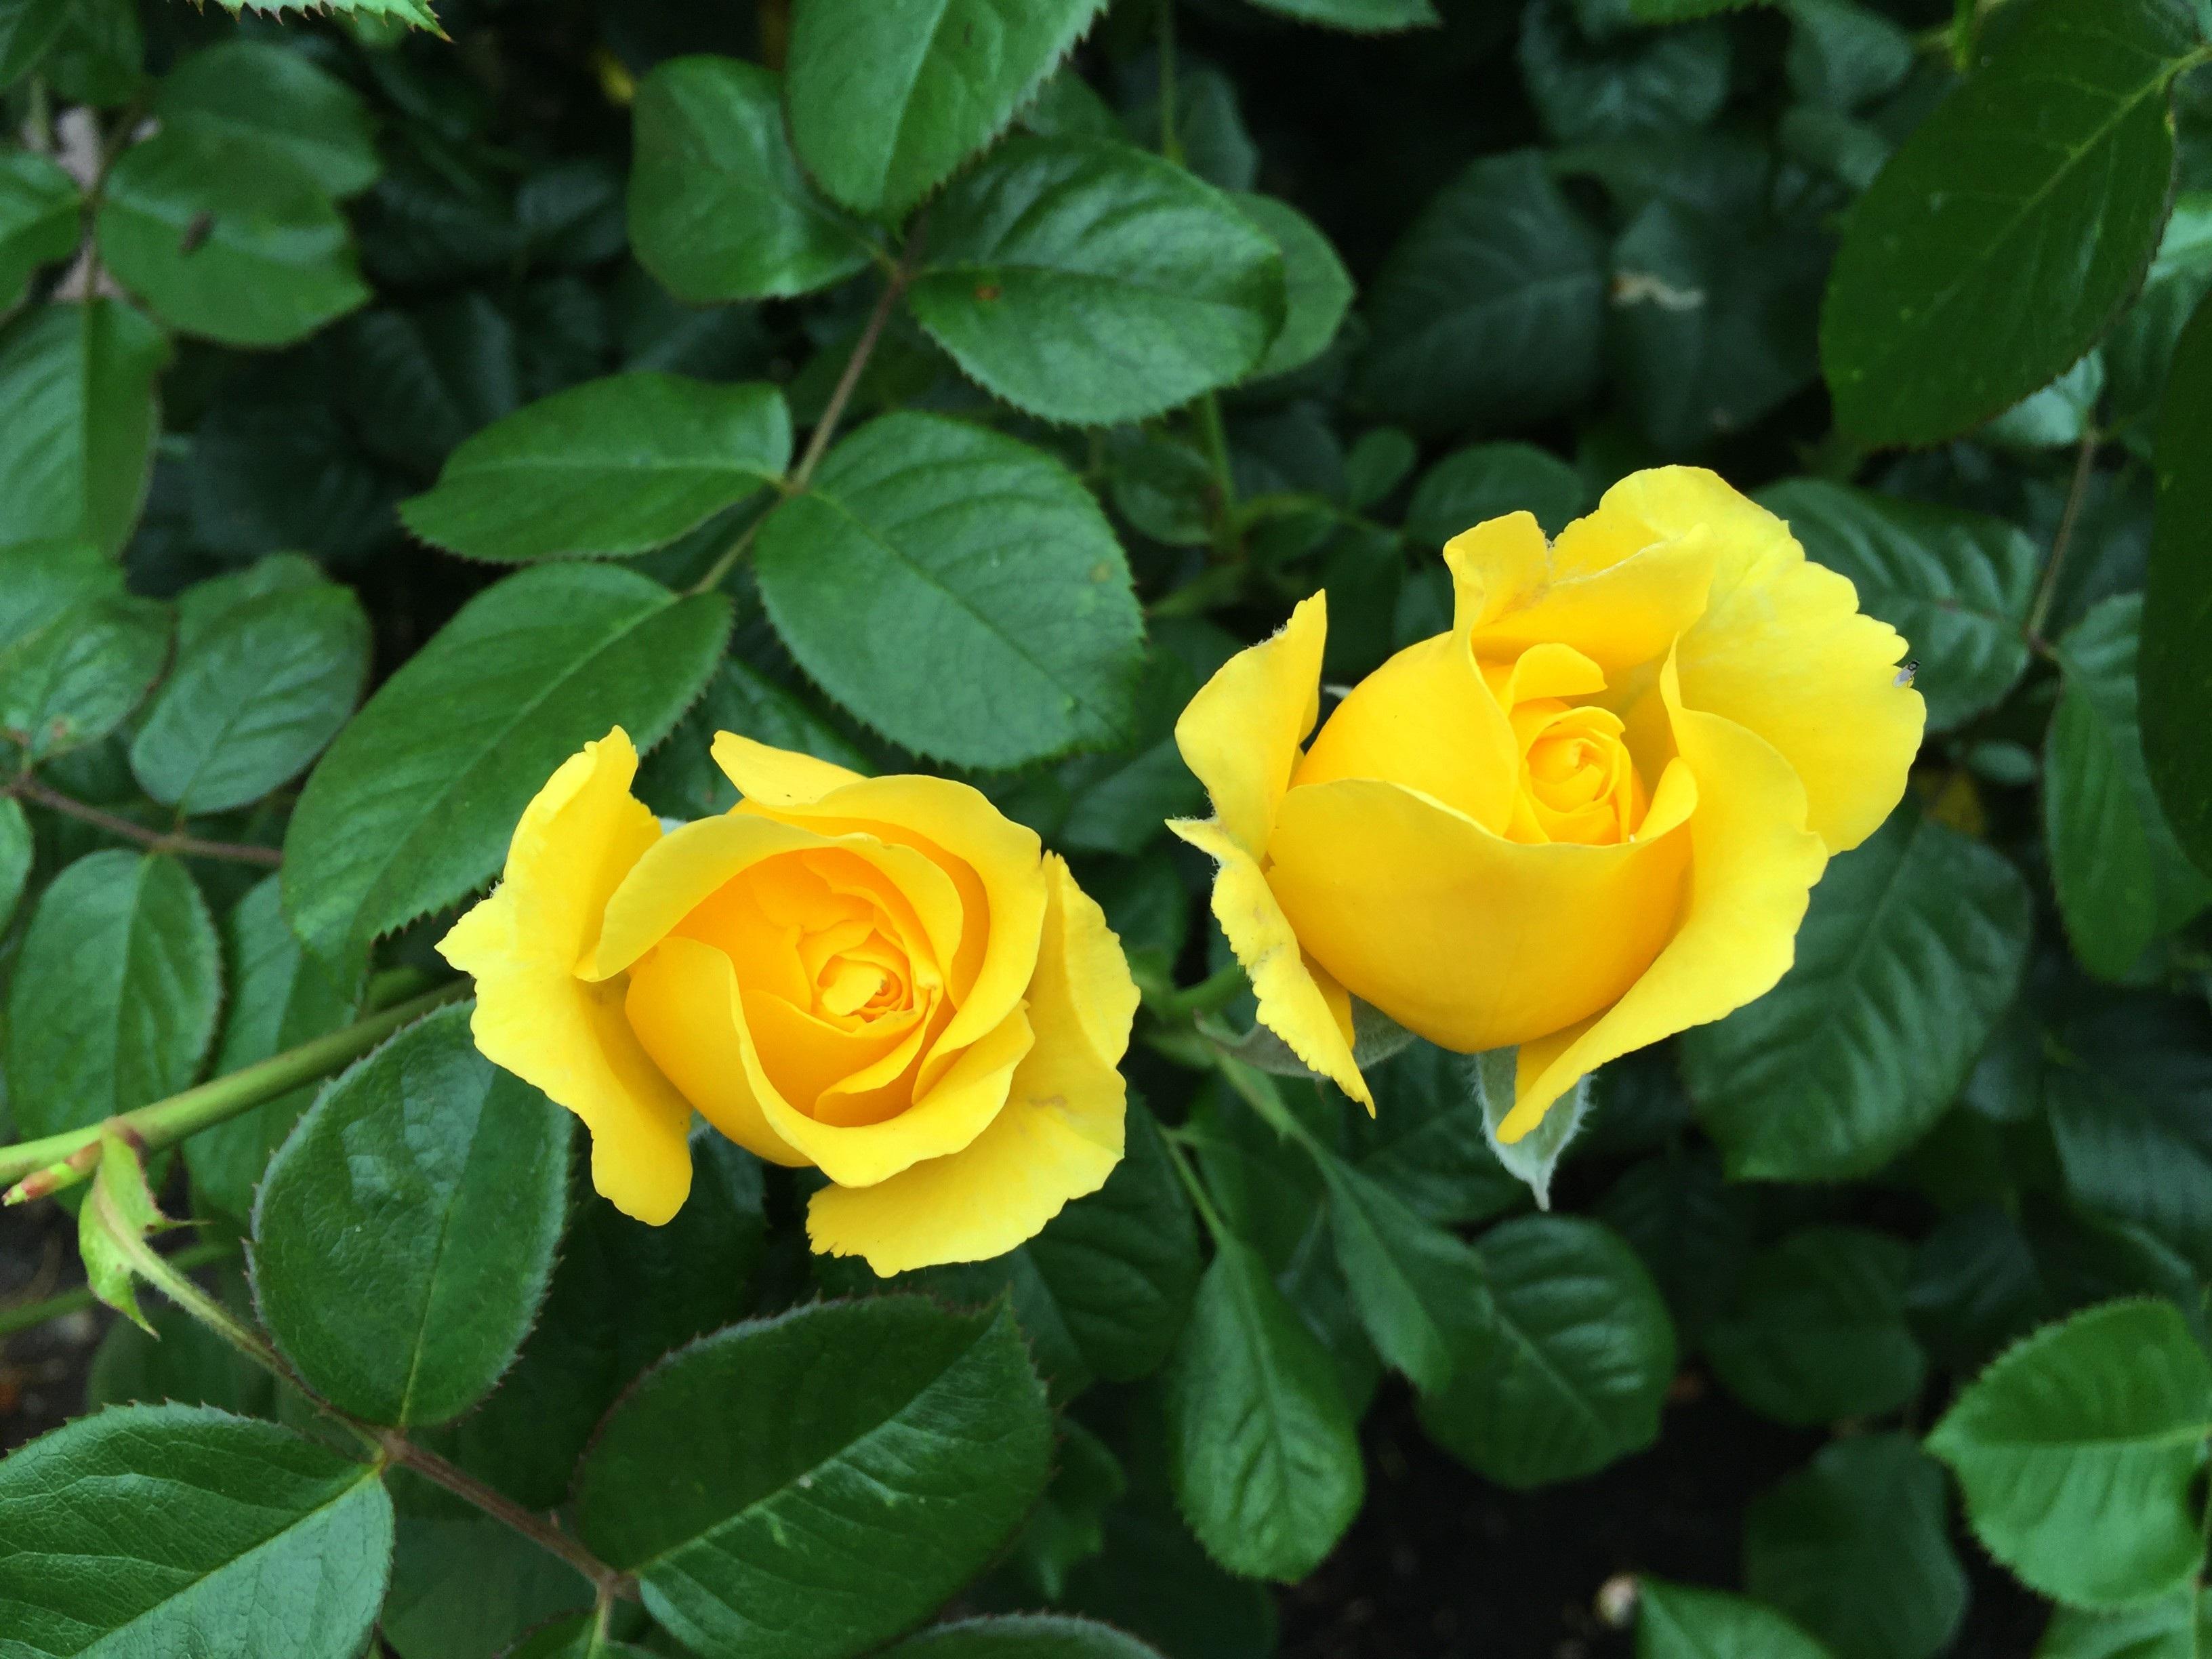 Free Images : Flower, Petal, Botany, Blooming, Flora, Rose